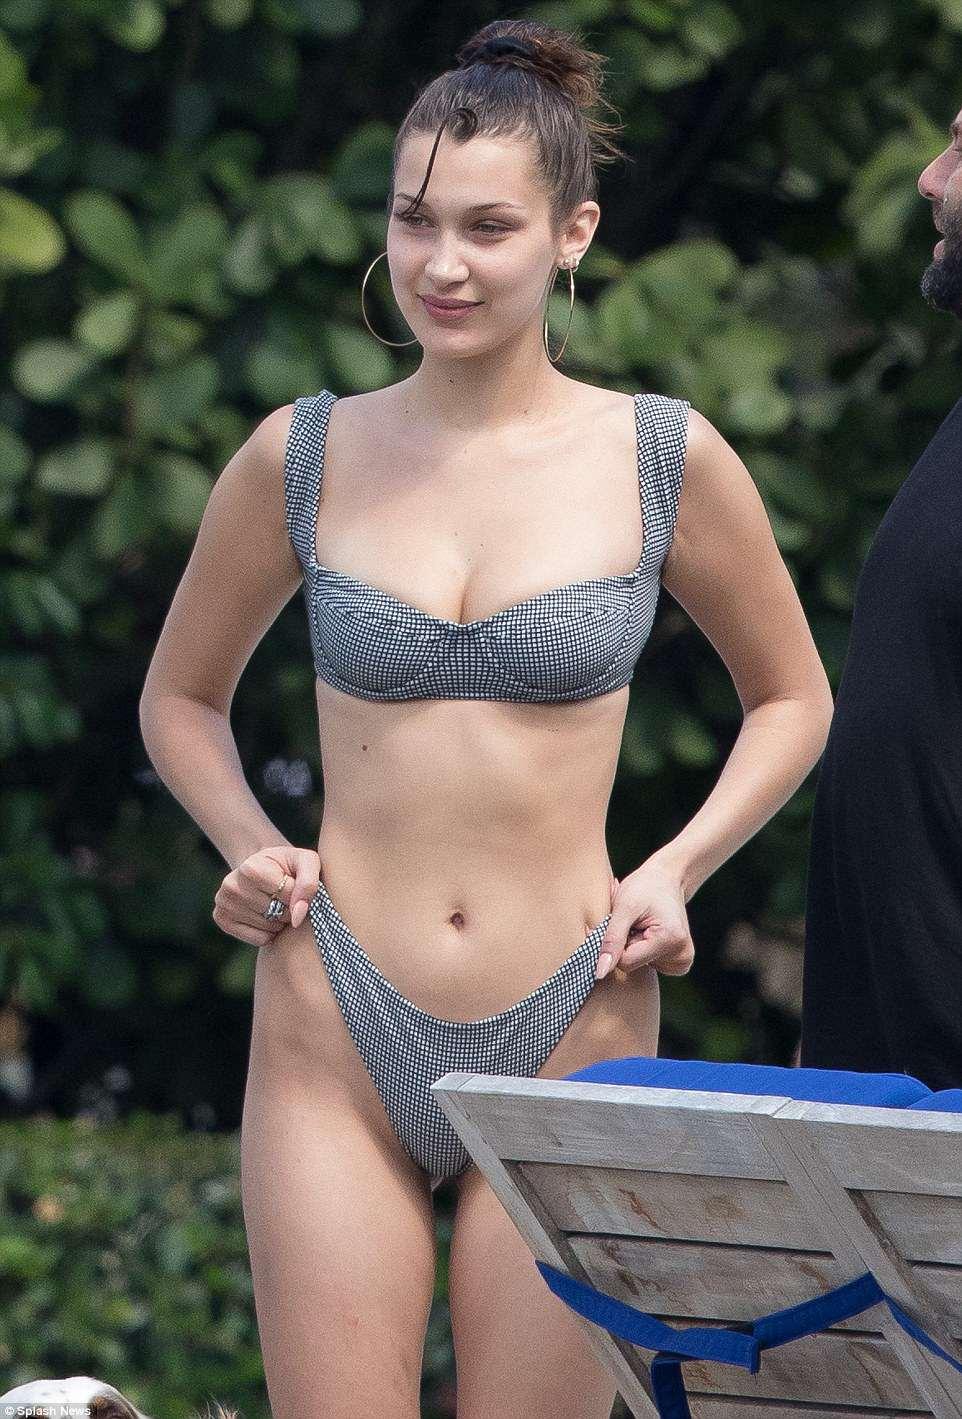 4BB644C400000578-5675773-Ready_to_take_a_dive_Bella_Hadid_was_back_in_a_bikini_on_Monday_-a-1_1525157503236